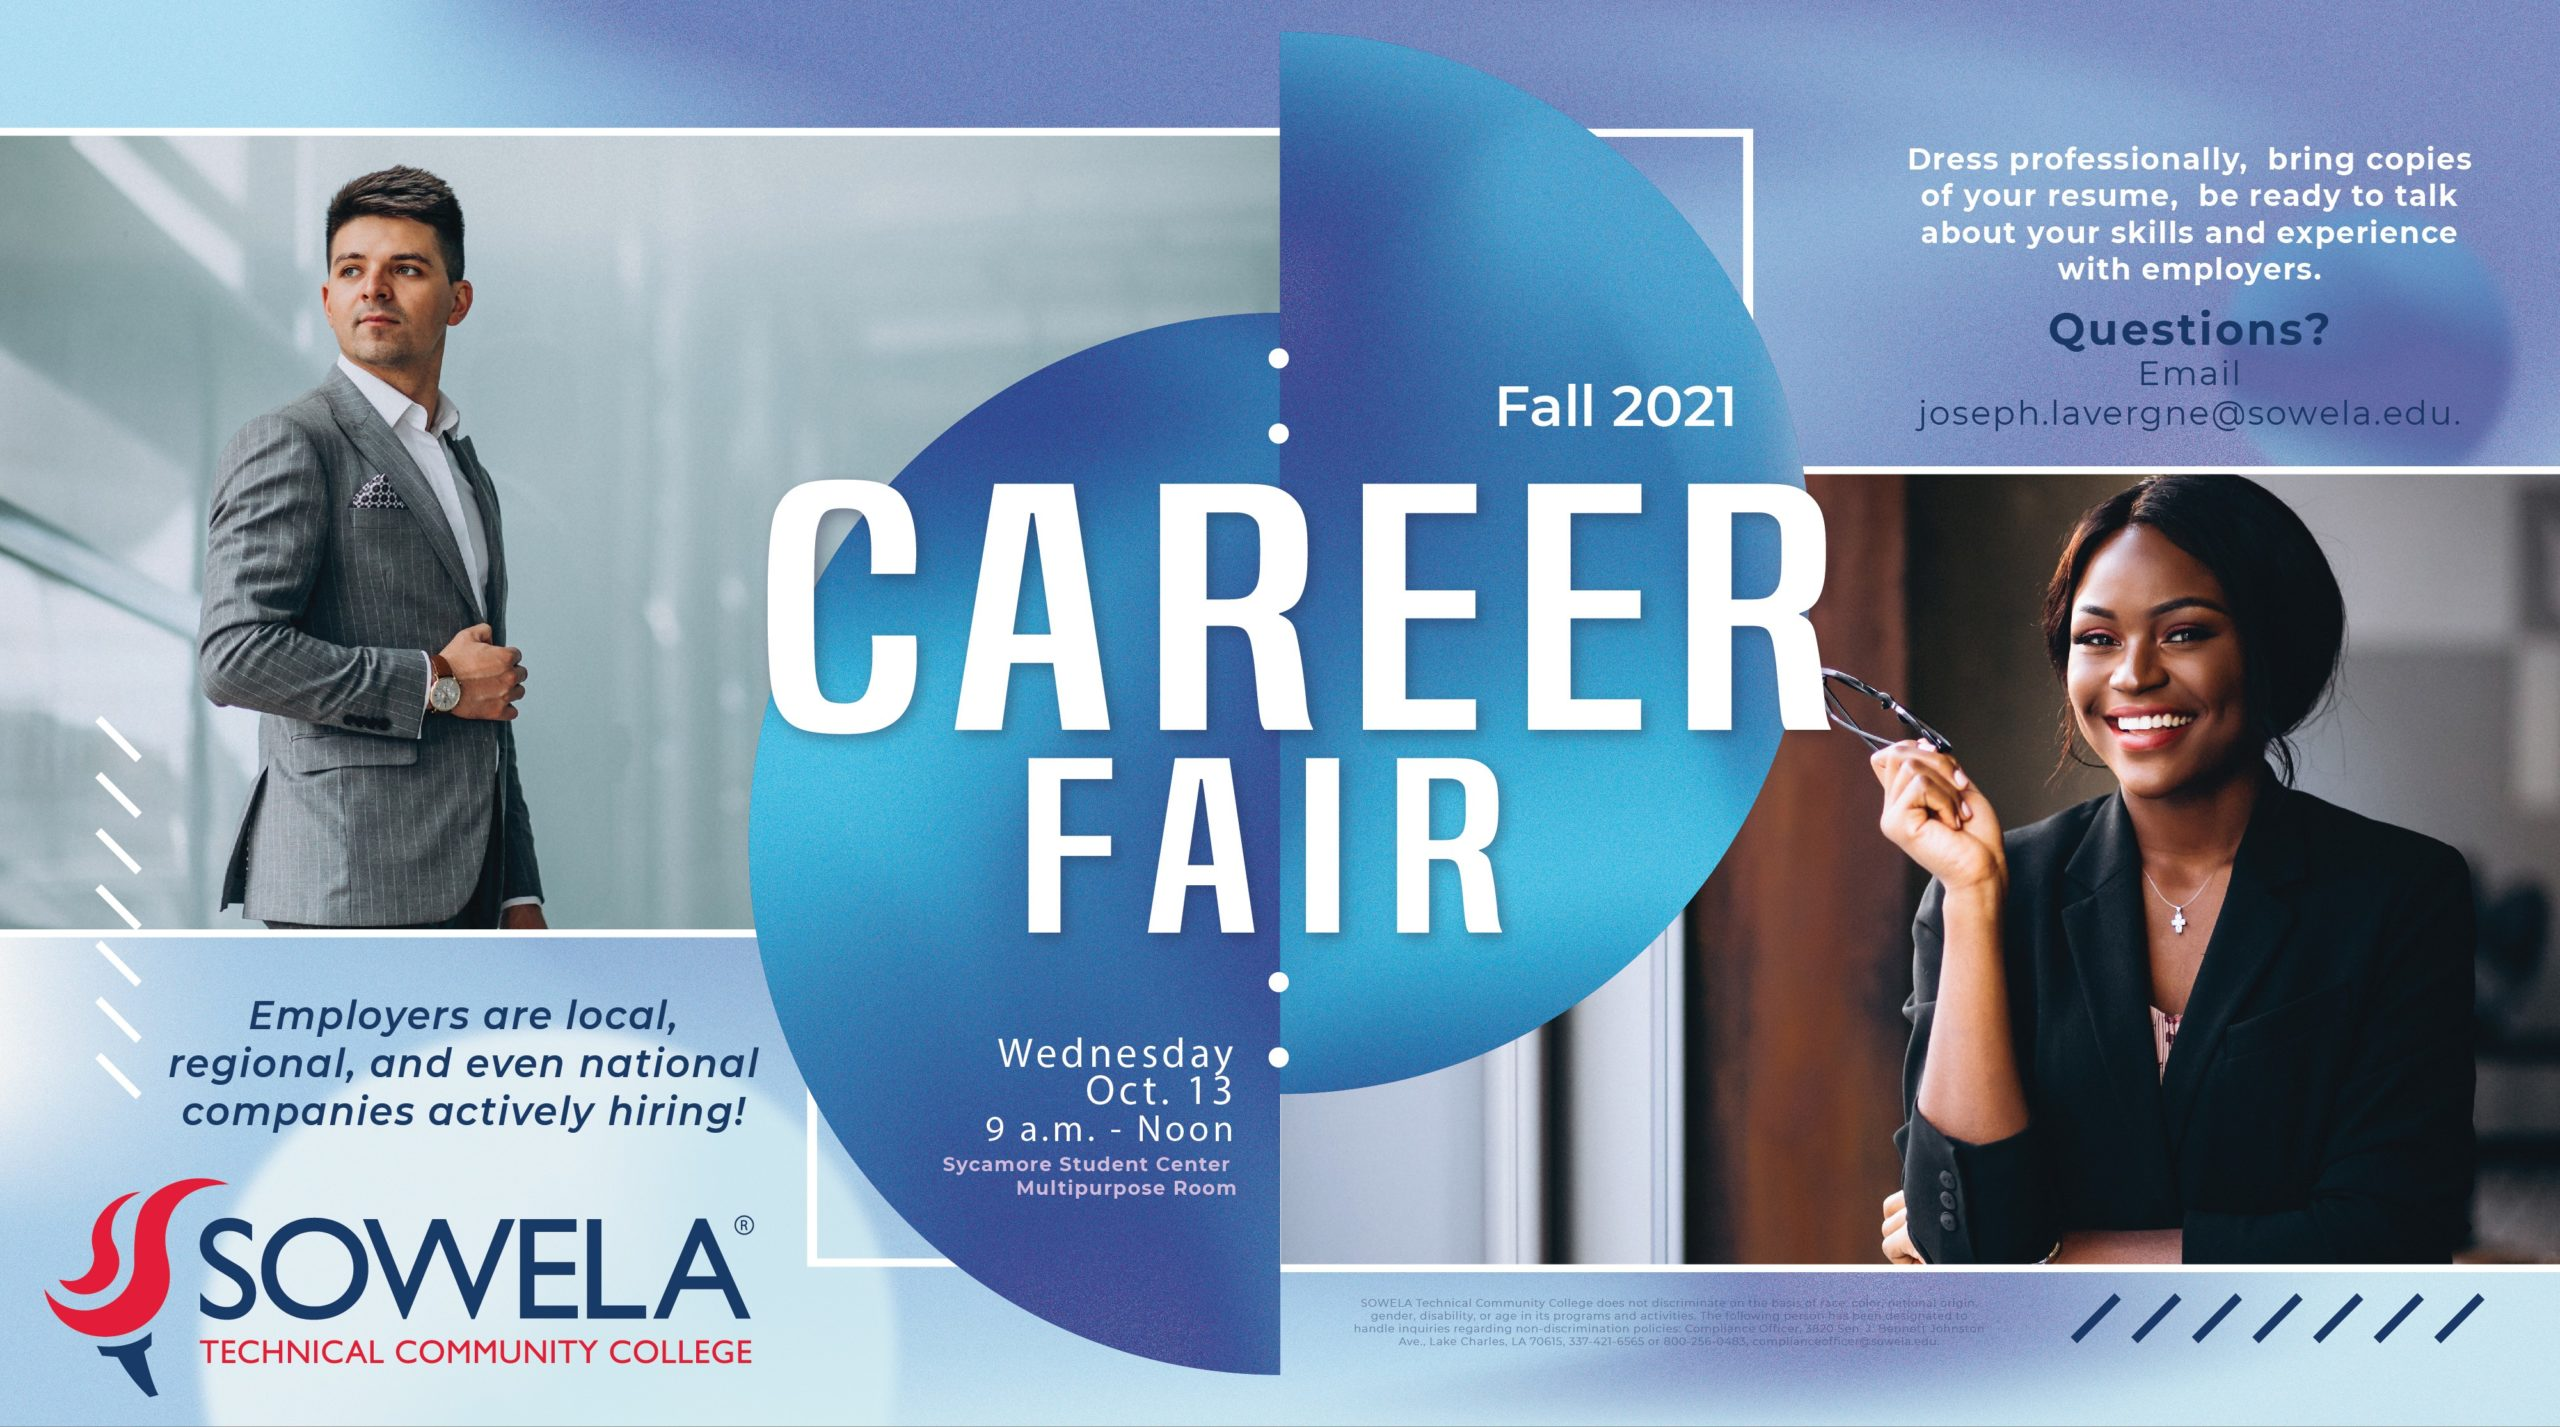 Fall 2021 Career Fair @ Sycamore Student Center